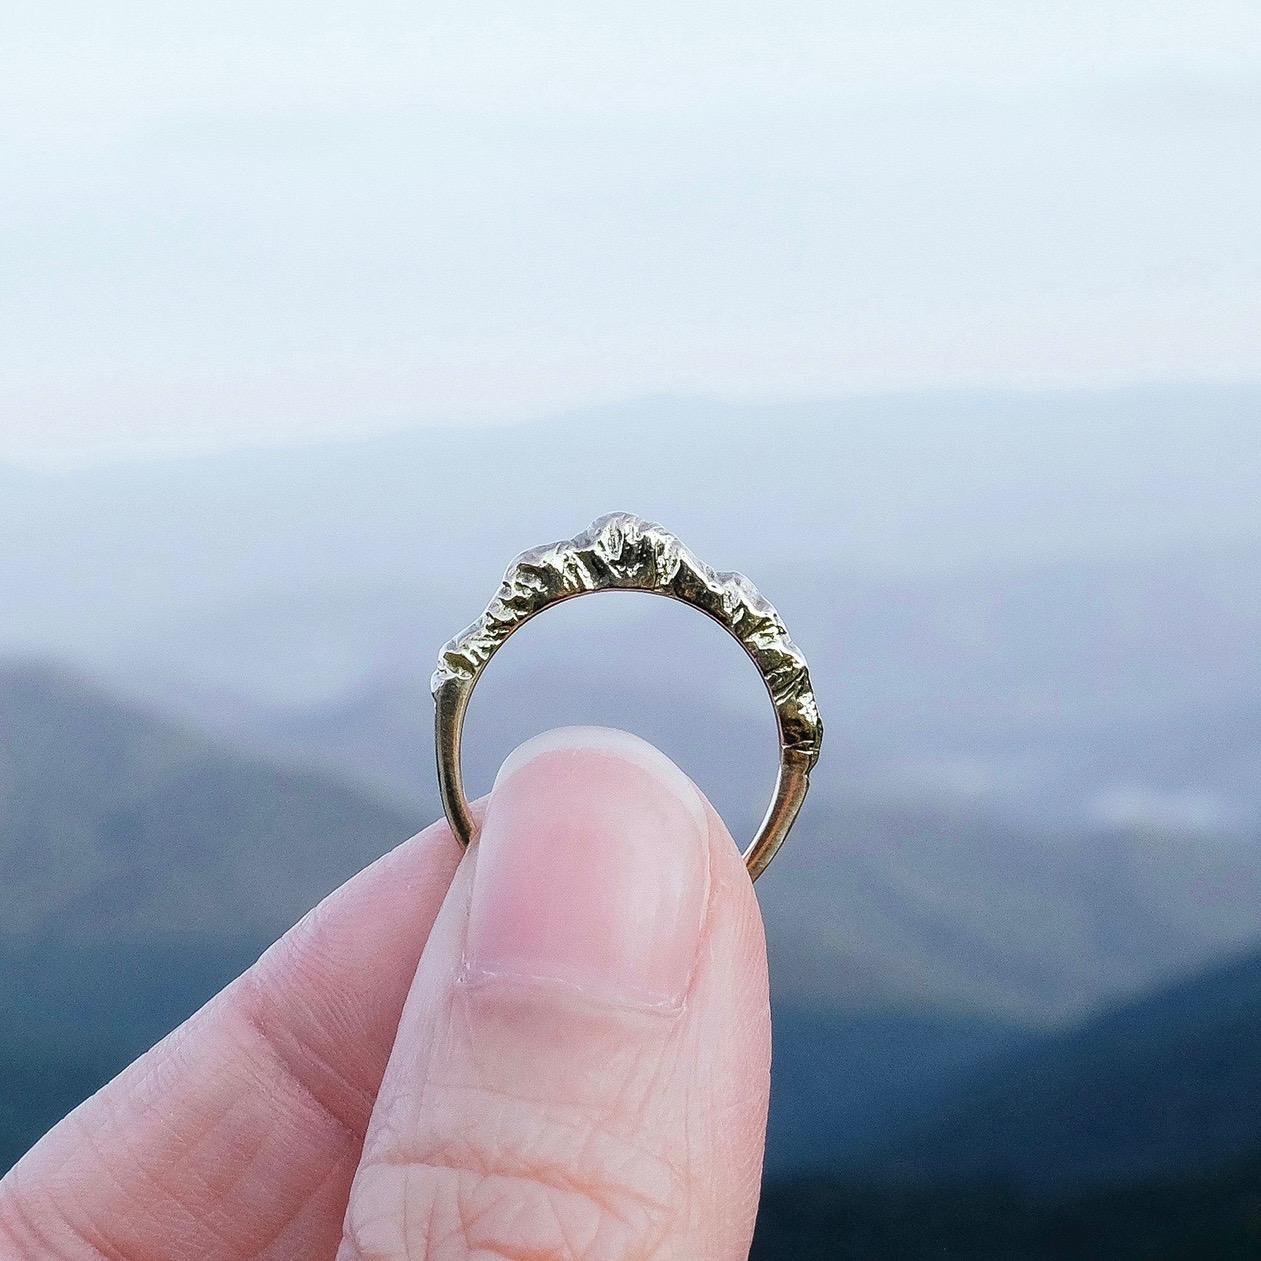 ring-crop 3.jpg